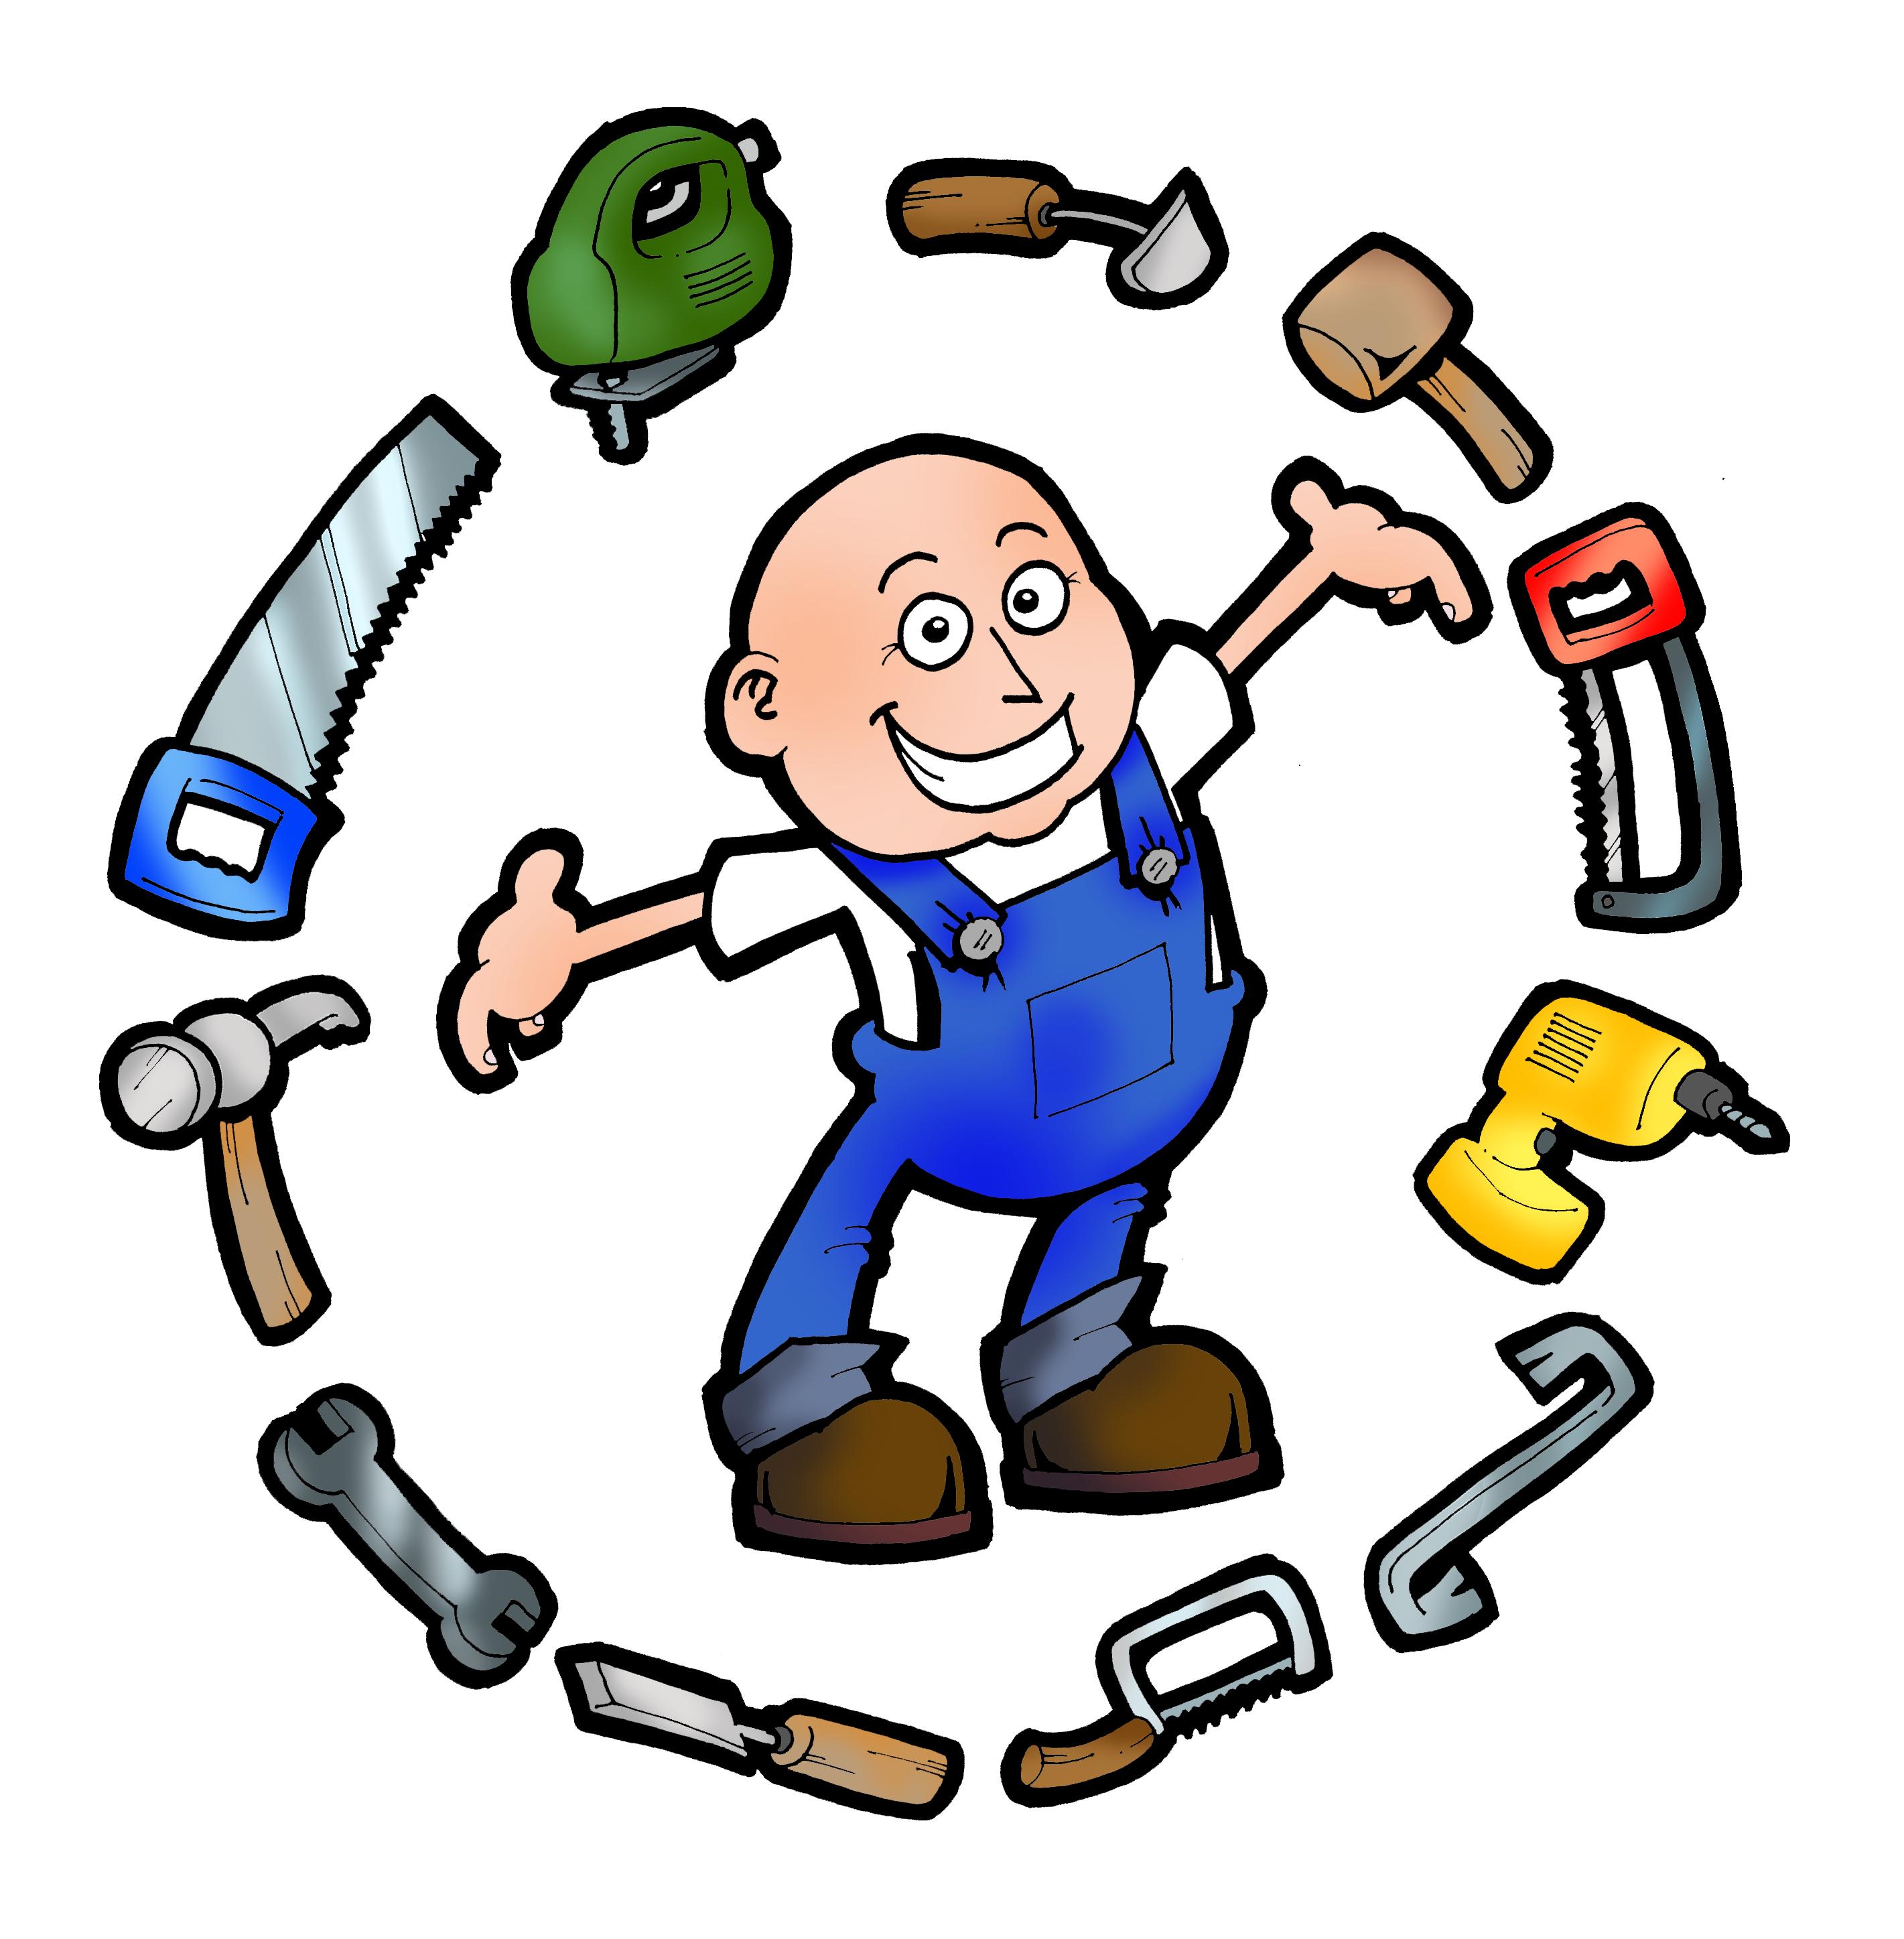 ... Free handyman logo clipart ...-... Free handyman logo clipart ...-15